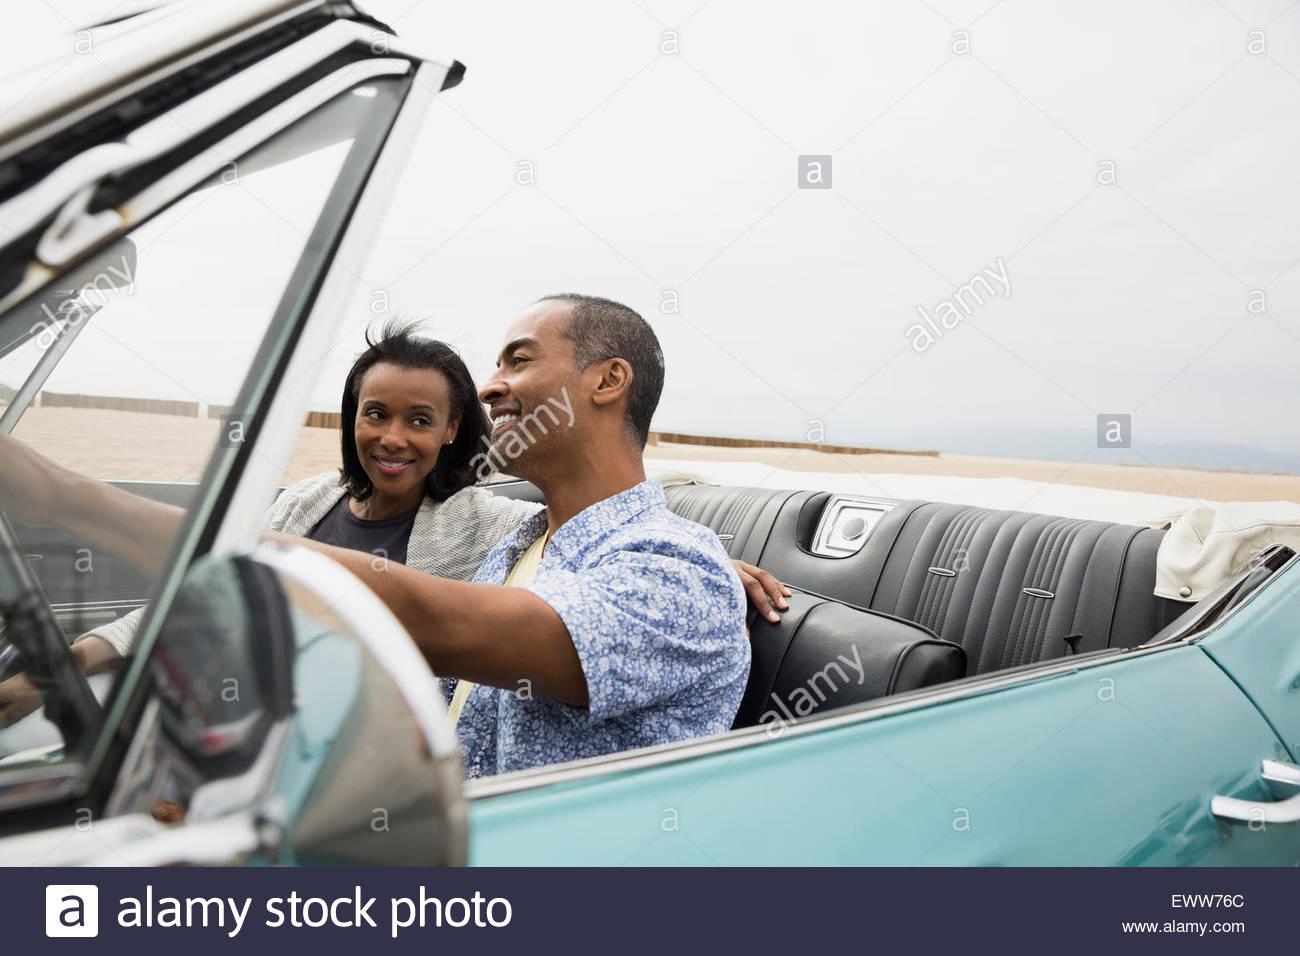 Couple riding in convertible along beach - Stock Image